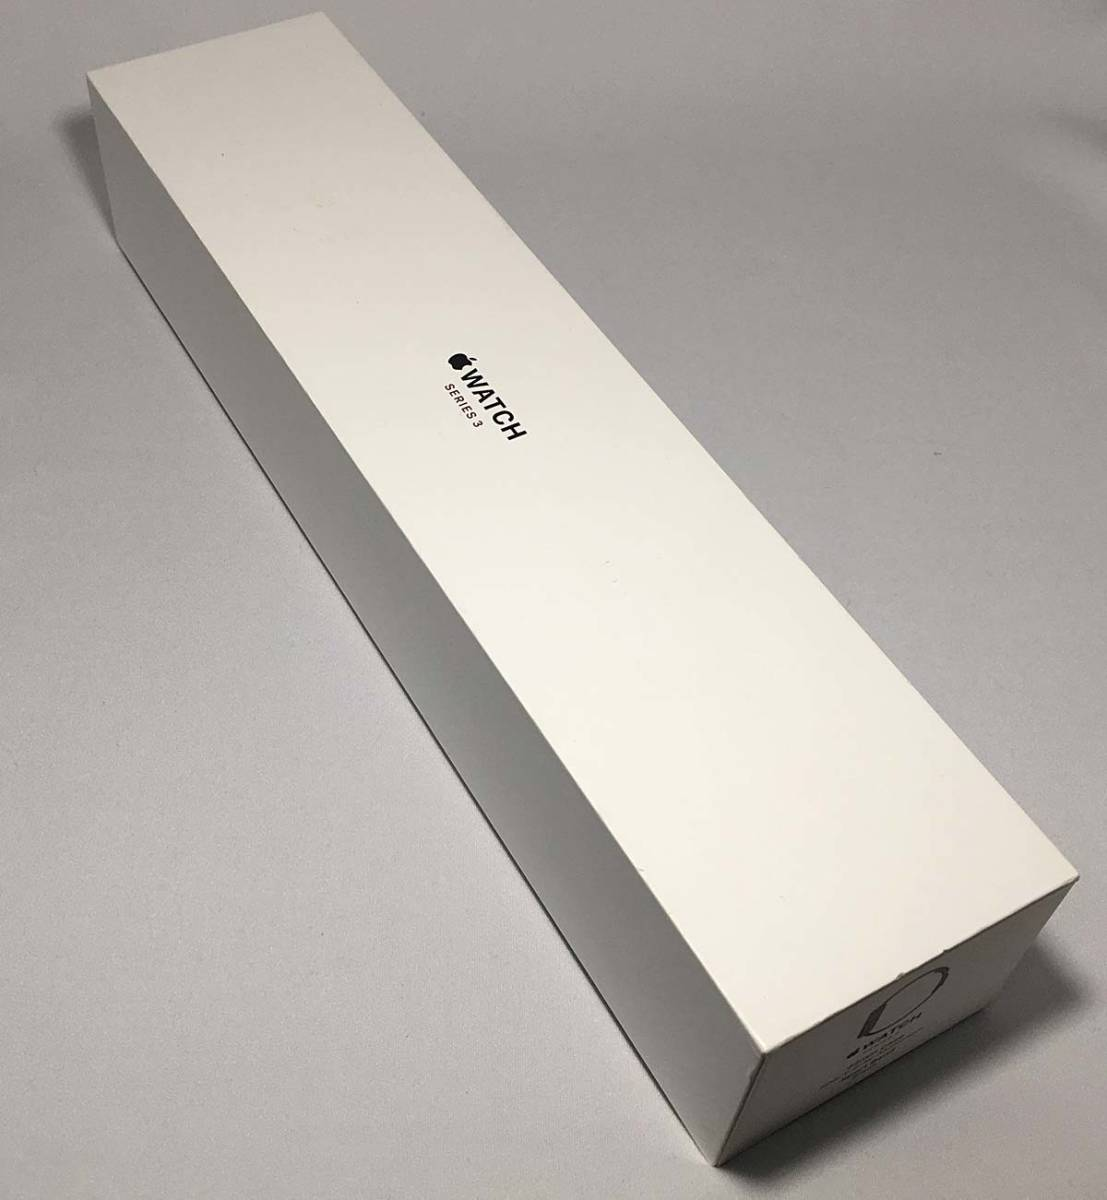 JUNK 箱 付属品 Apple Watch Series 3 GPS+Cellular 42mm MQKN2J/A A1891 アクティベーションロック ジャンク 部品取 アップル ウォッチ_画像7